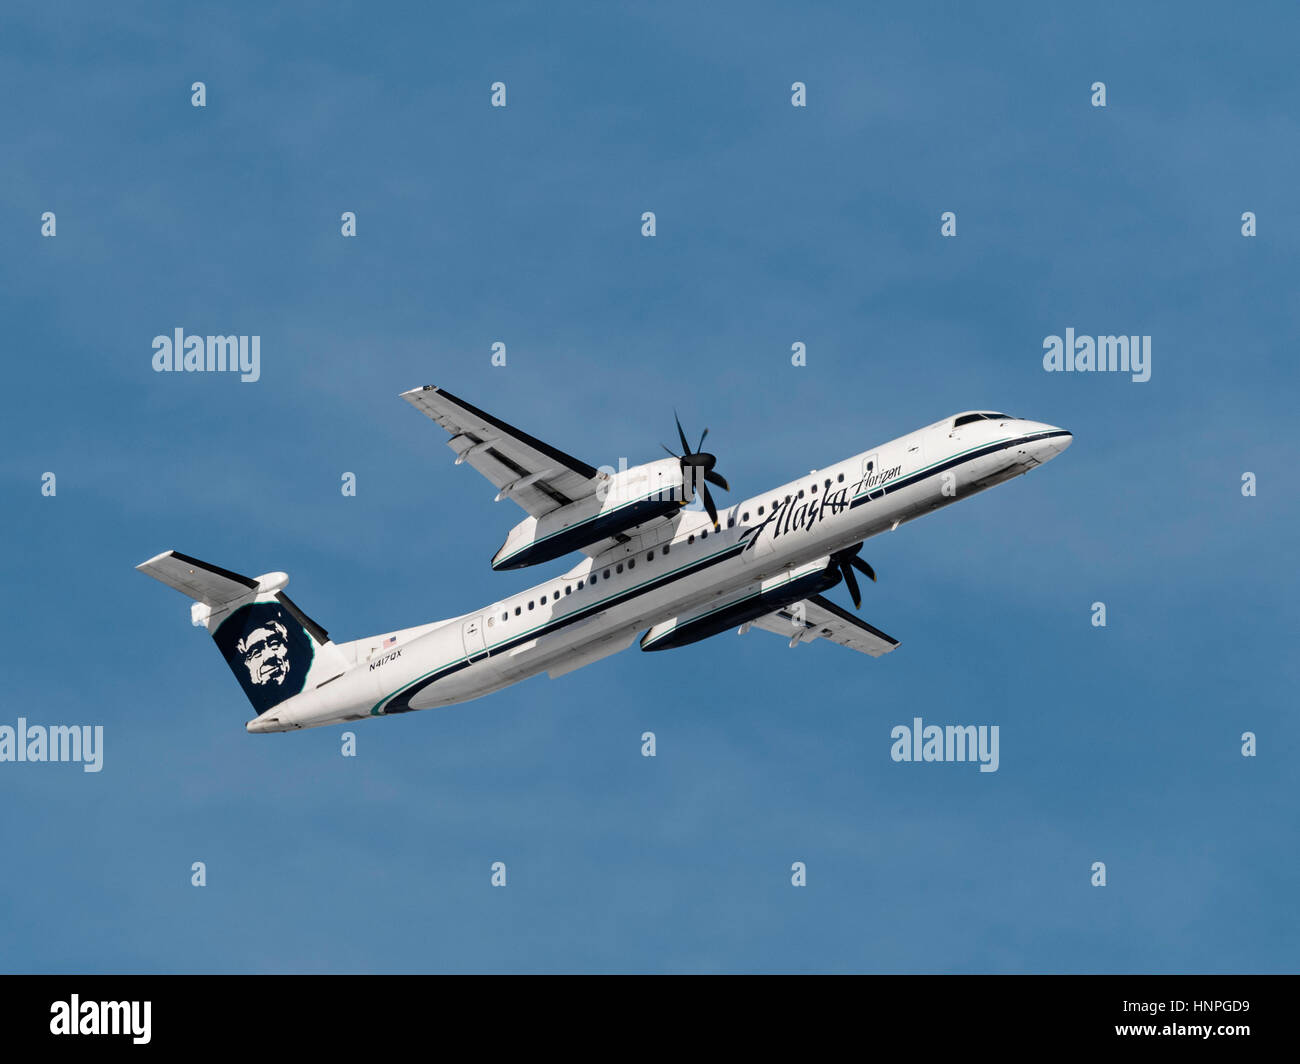 Alaska Airlines (Horizon Air) plane airplane Bombardier Dash 8 Q400 turboprop regional airliner airborne take taking - Stock Image